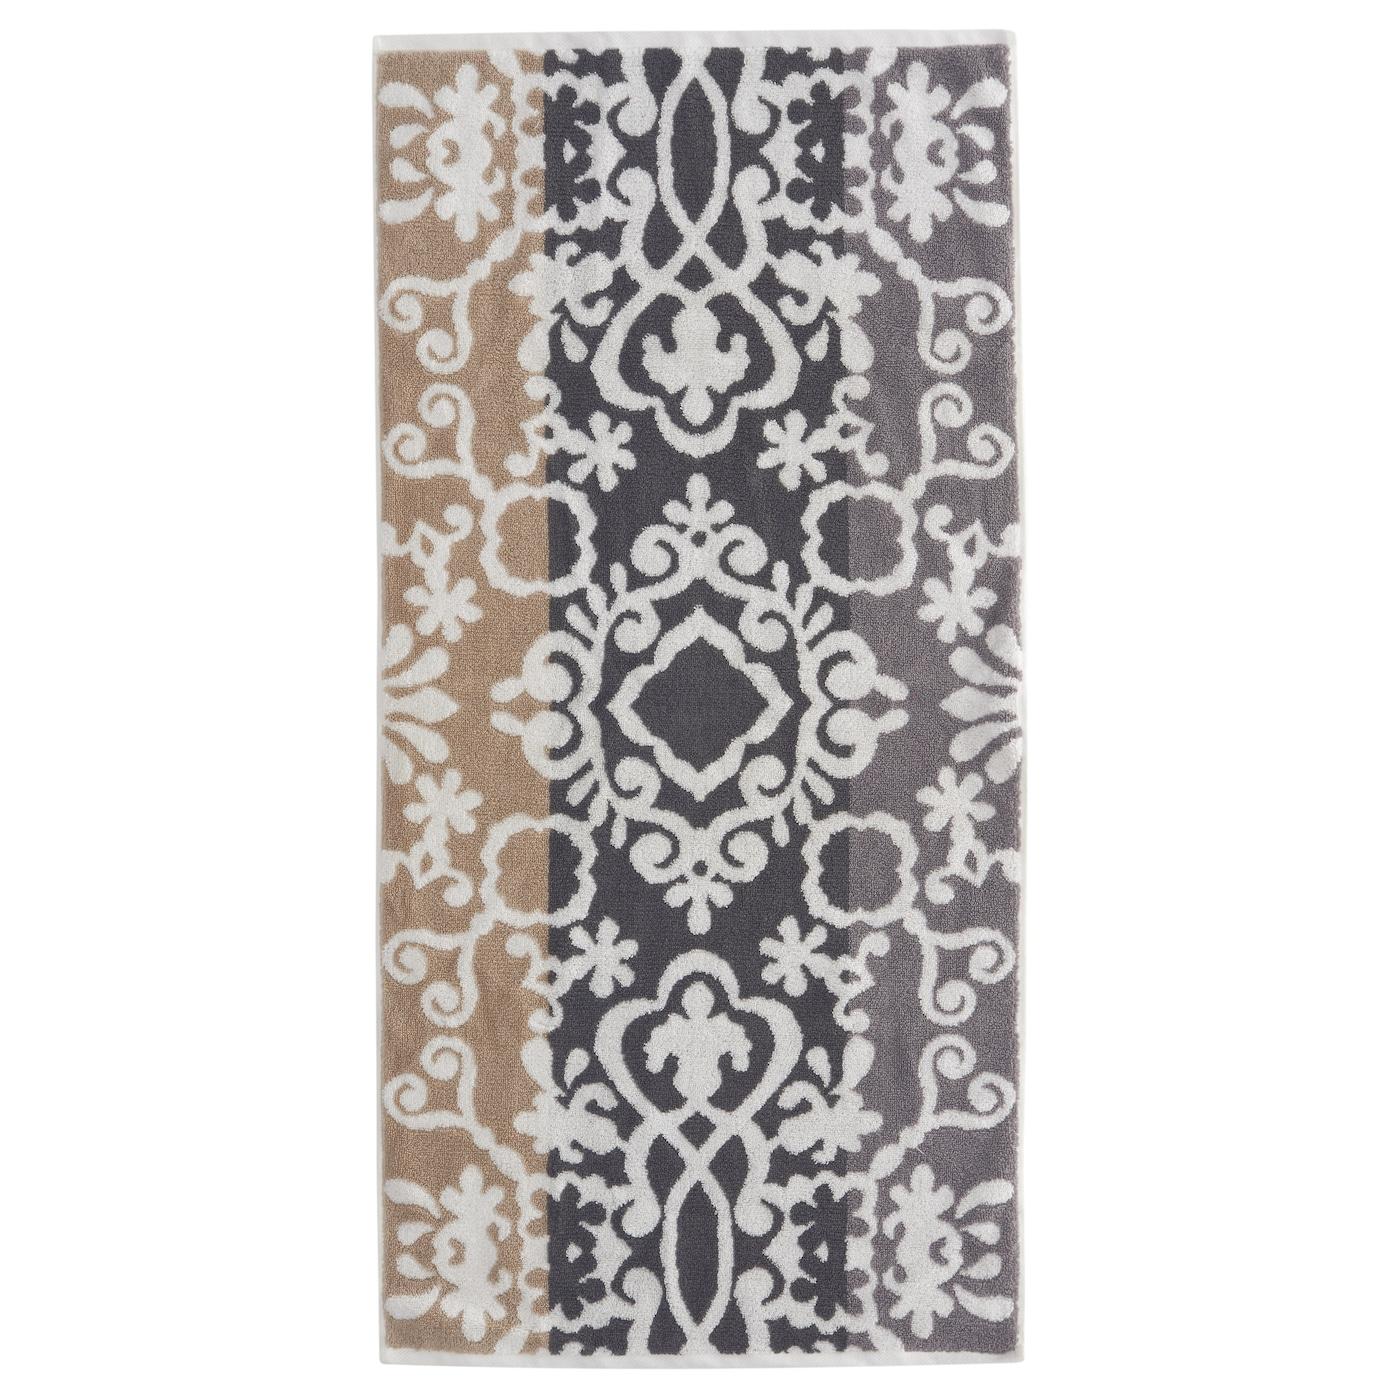 bl djan drap de bain multicolore 70x140 cm ikea. Black Bedroom Furniture Sets. Home Design Ideas